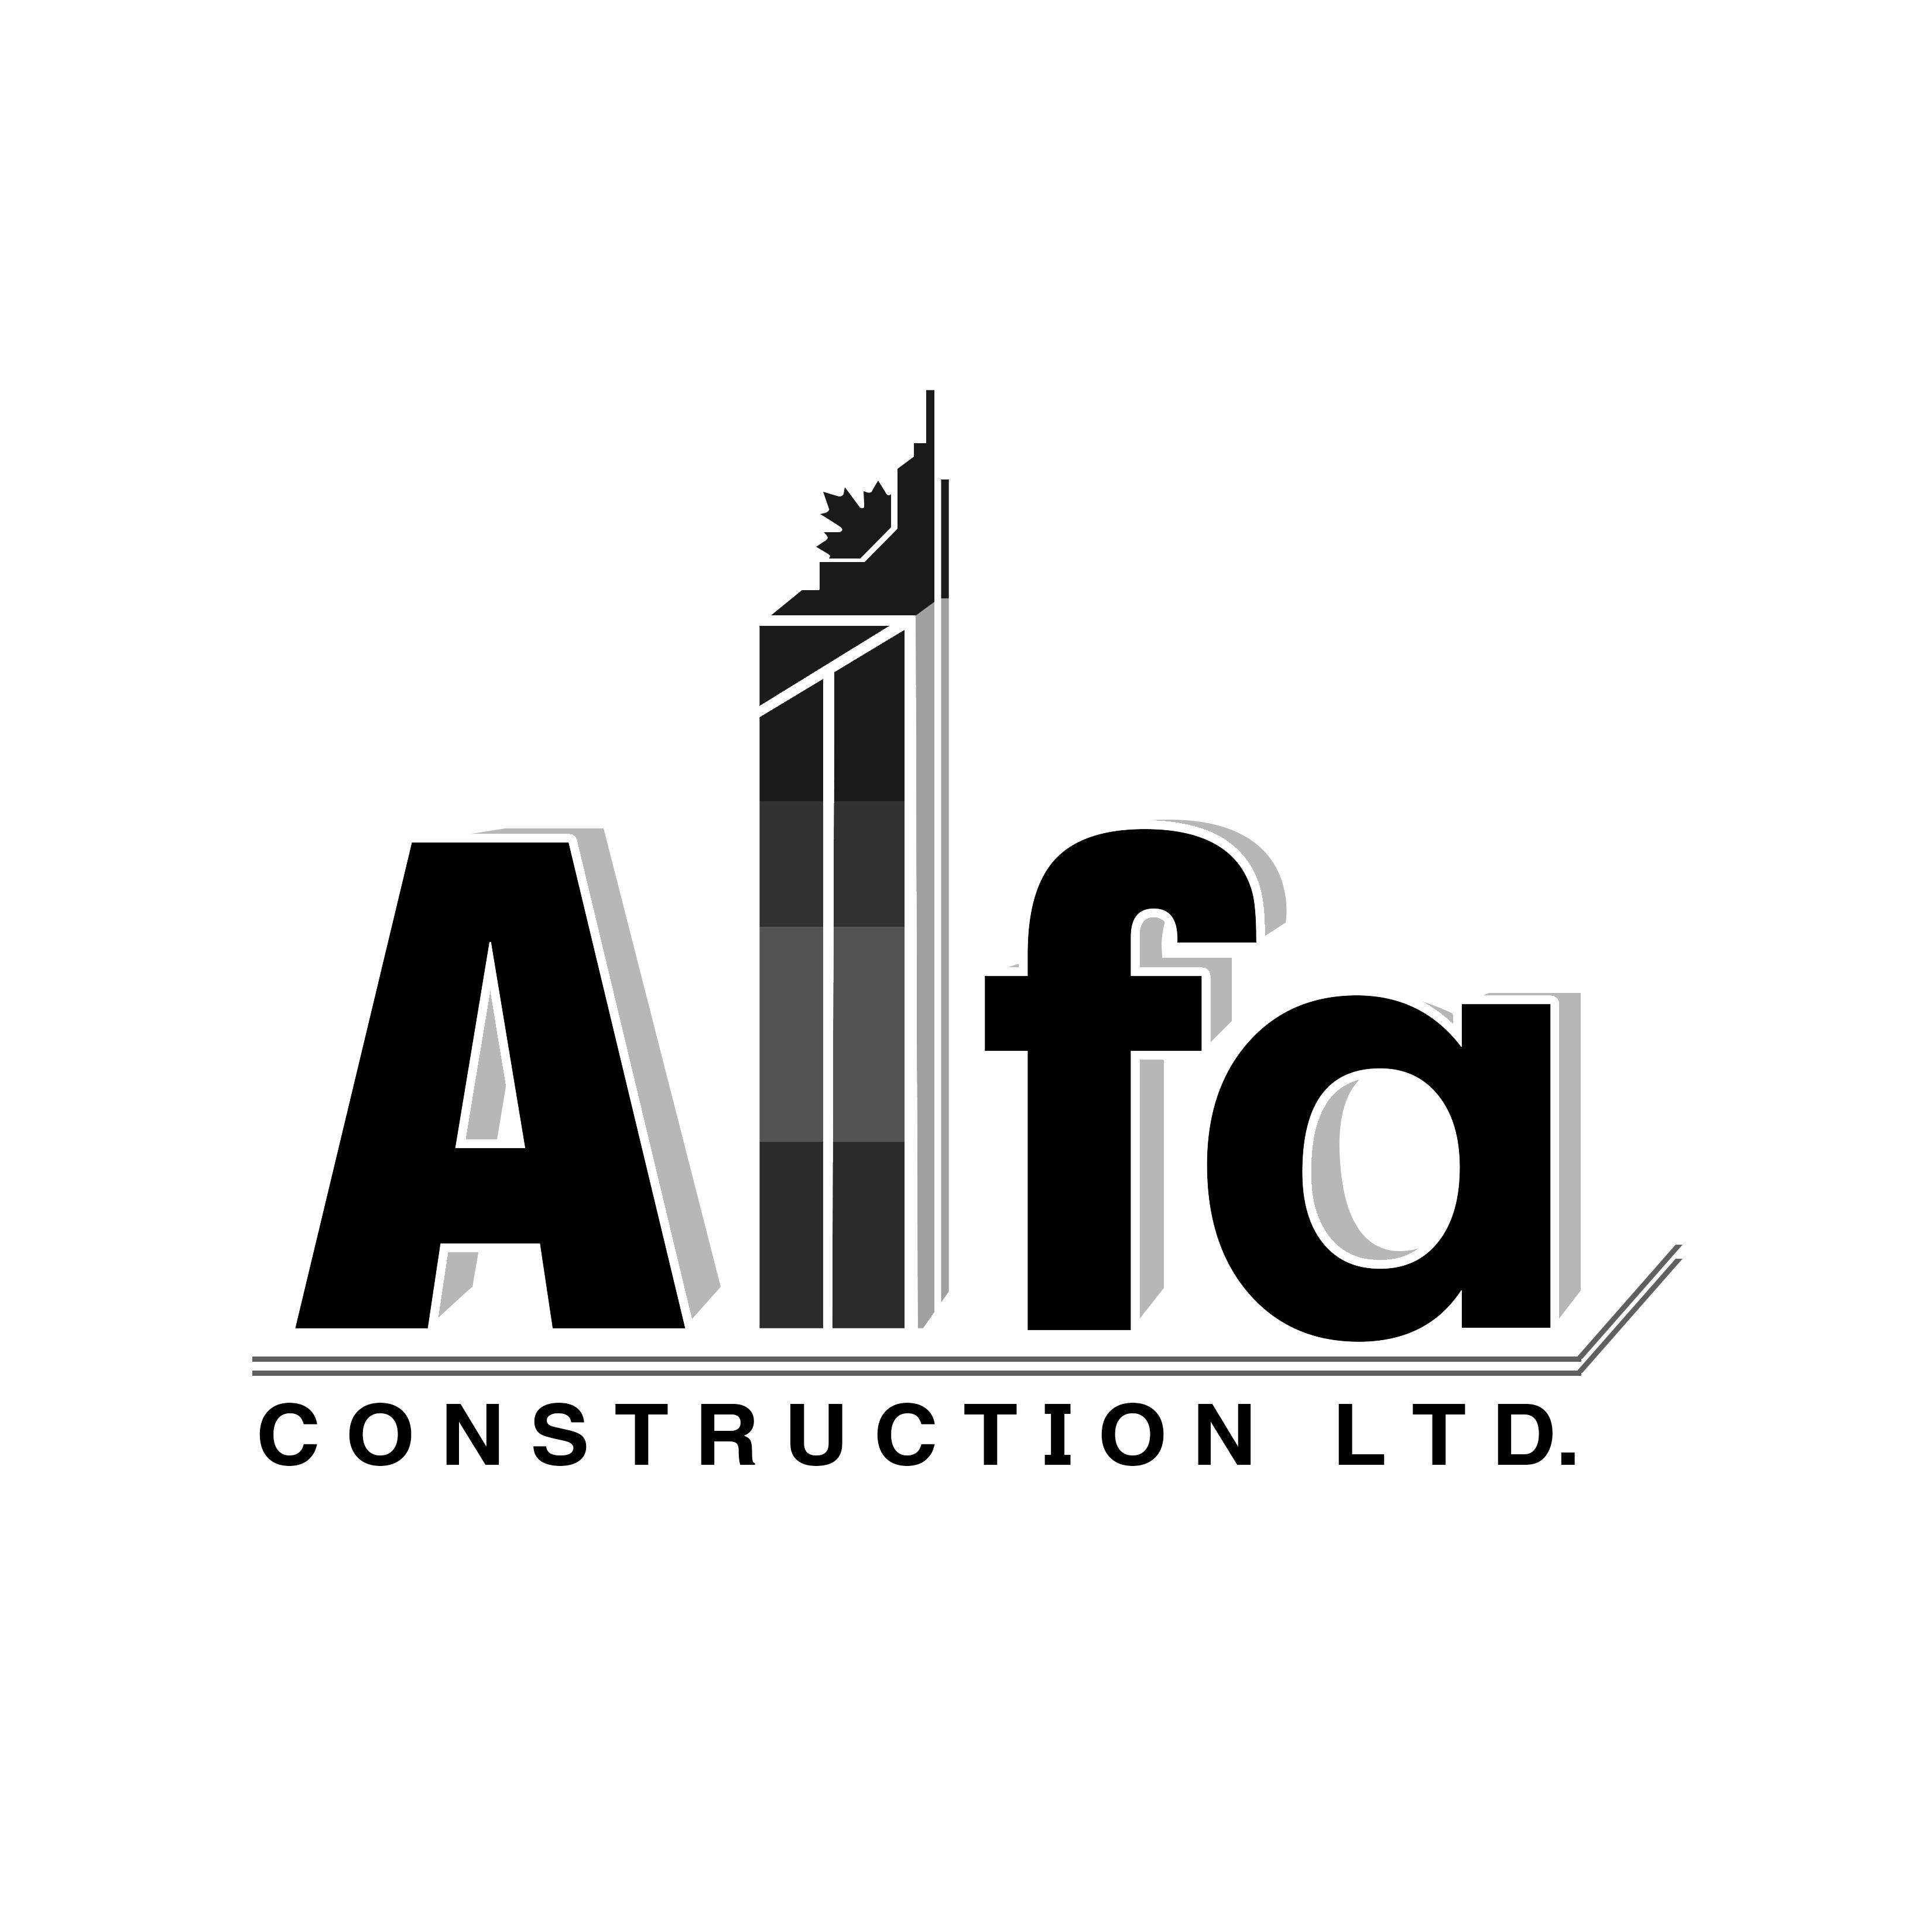 Logo Design by Allan Esclamado - Entry No. 33 in the Logo Design Contest Fun Logo Design for Alfa Construction Ltd.